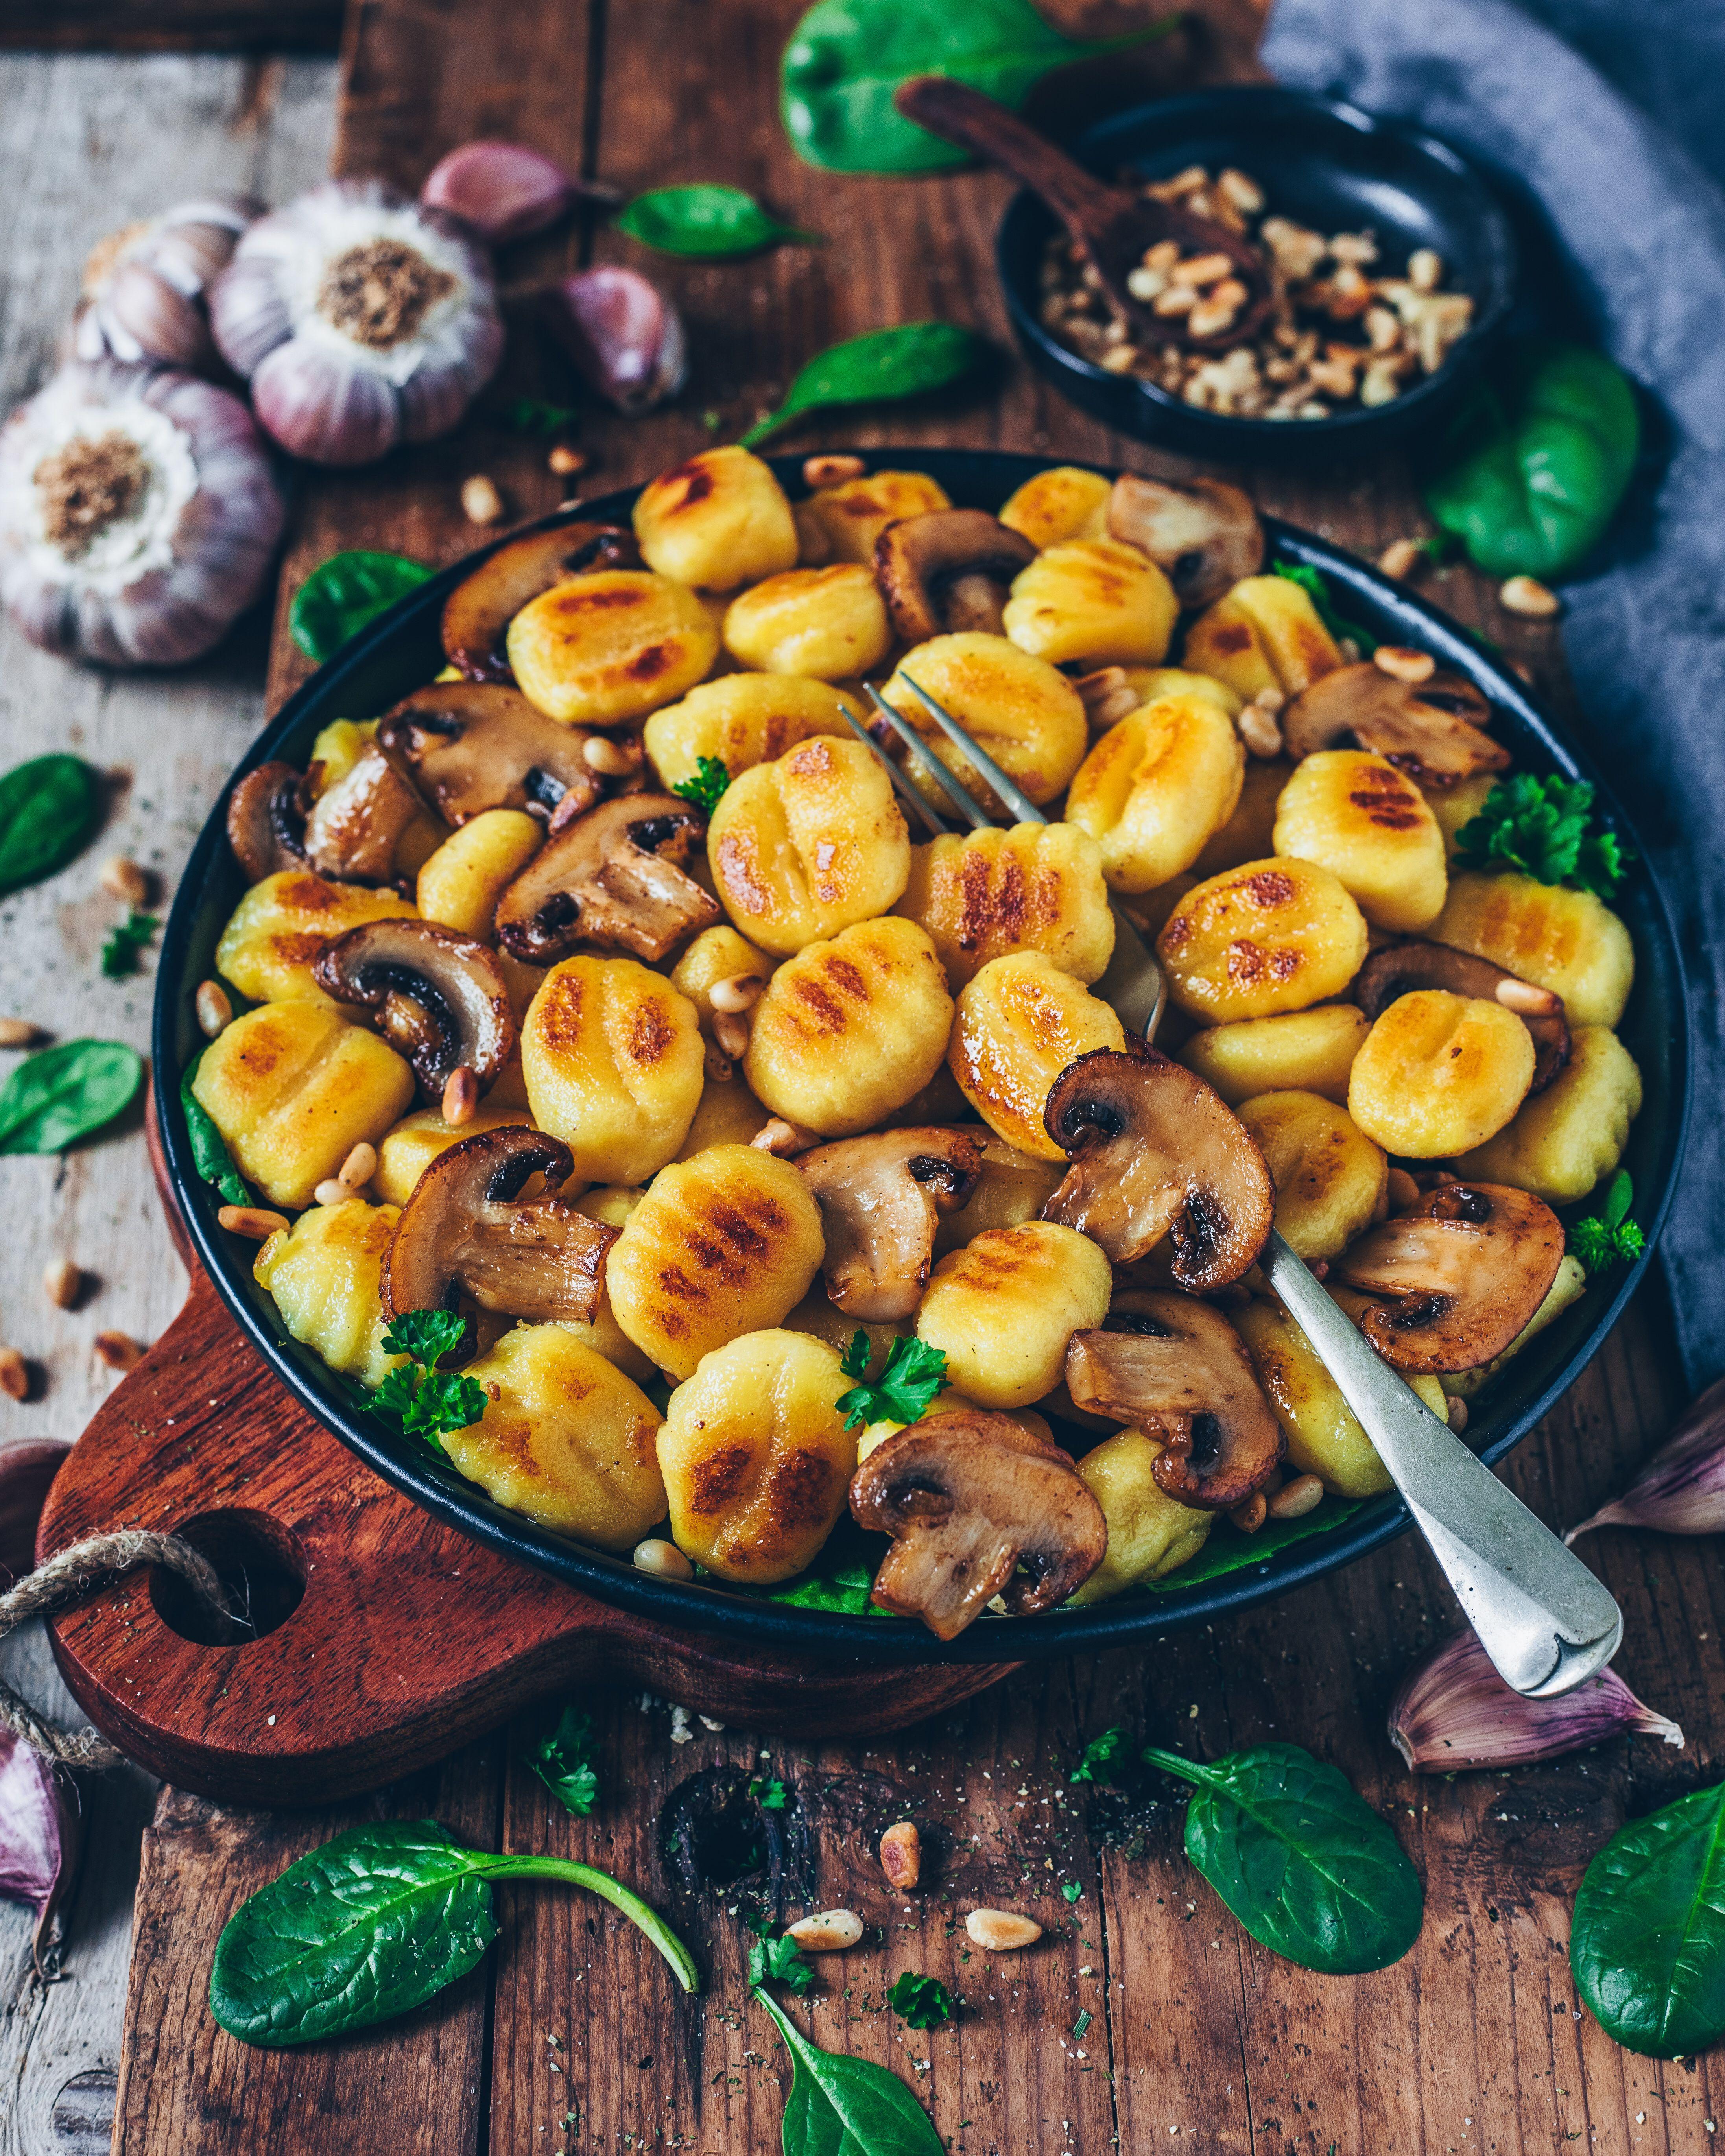 Crispy Roasted Gnocchi With Garlic Mushrooms Vegan Power